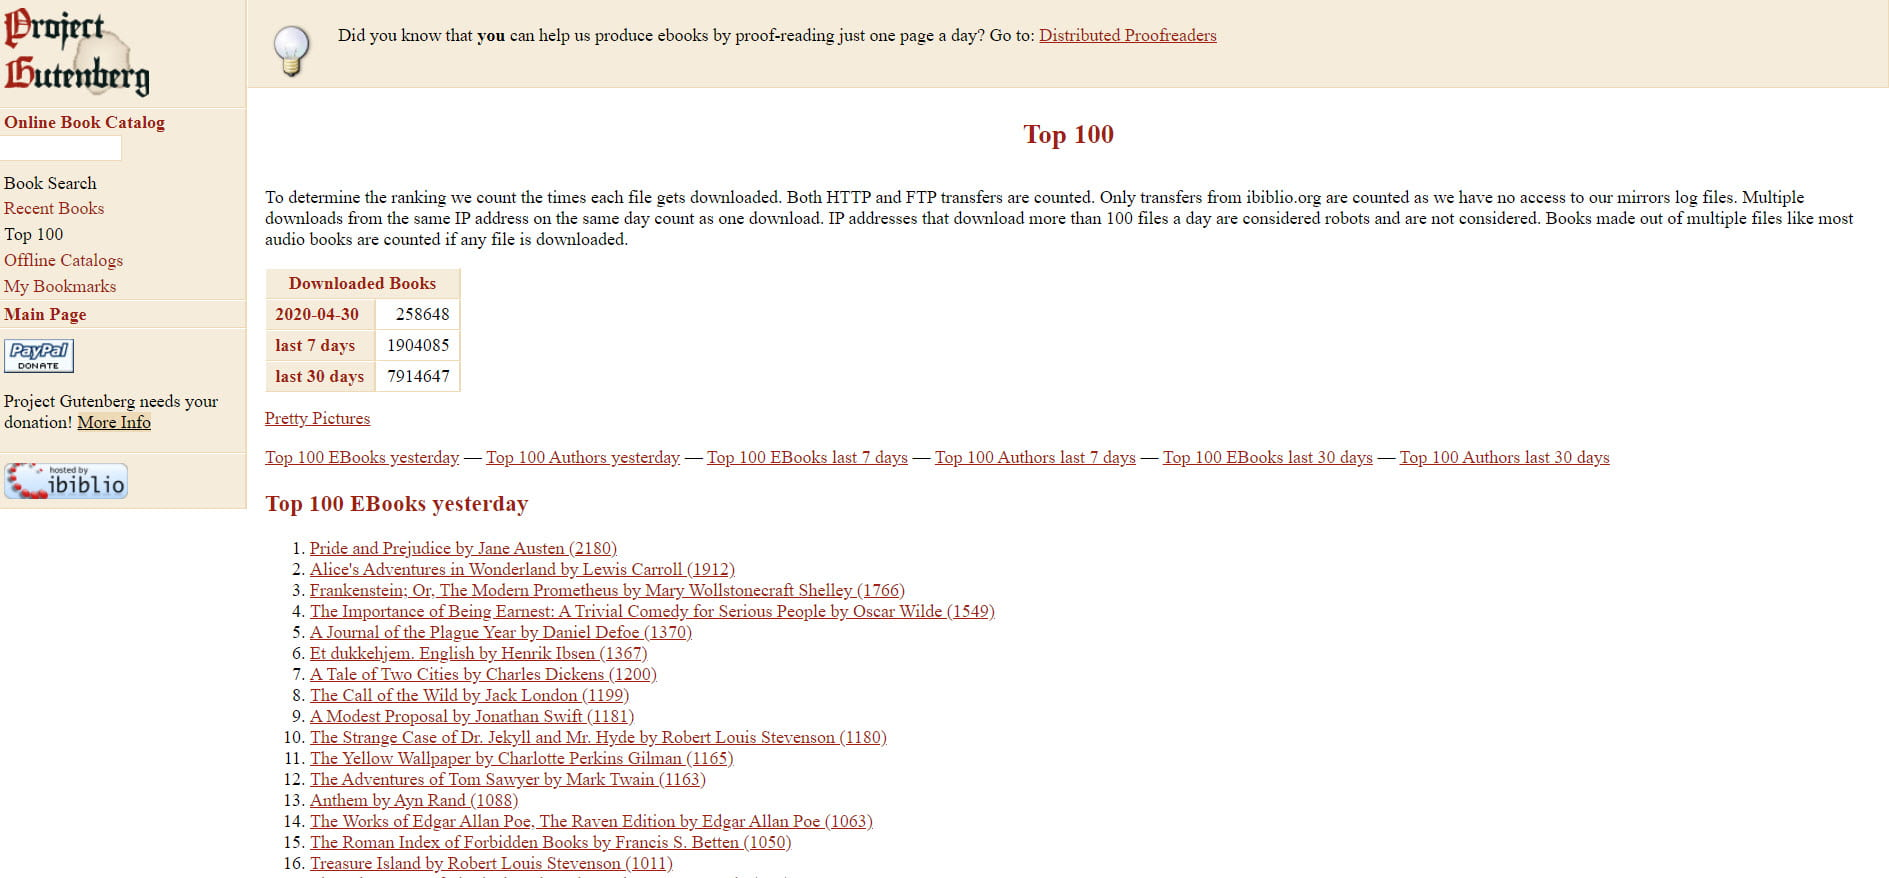 Top 100 lists Project Gutenberg